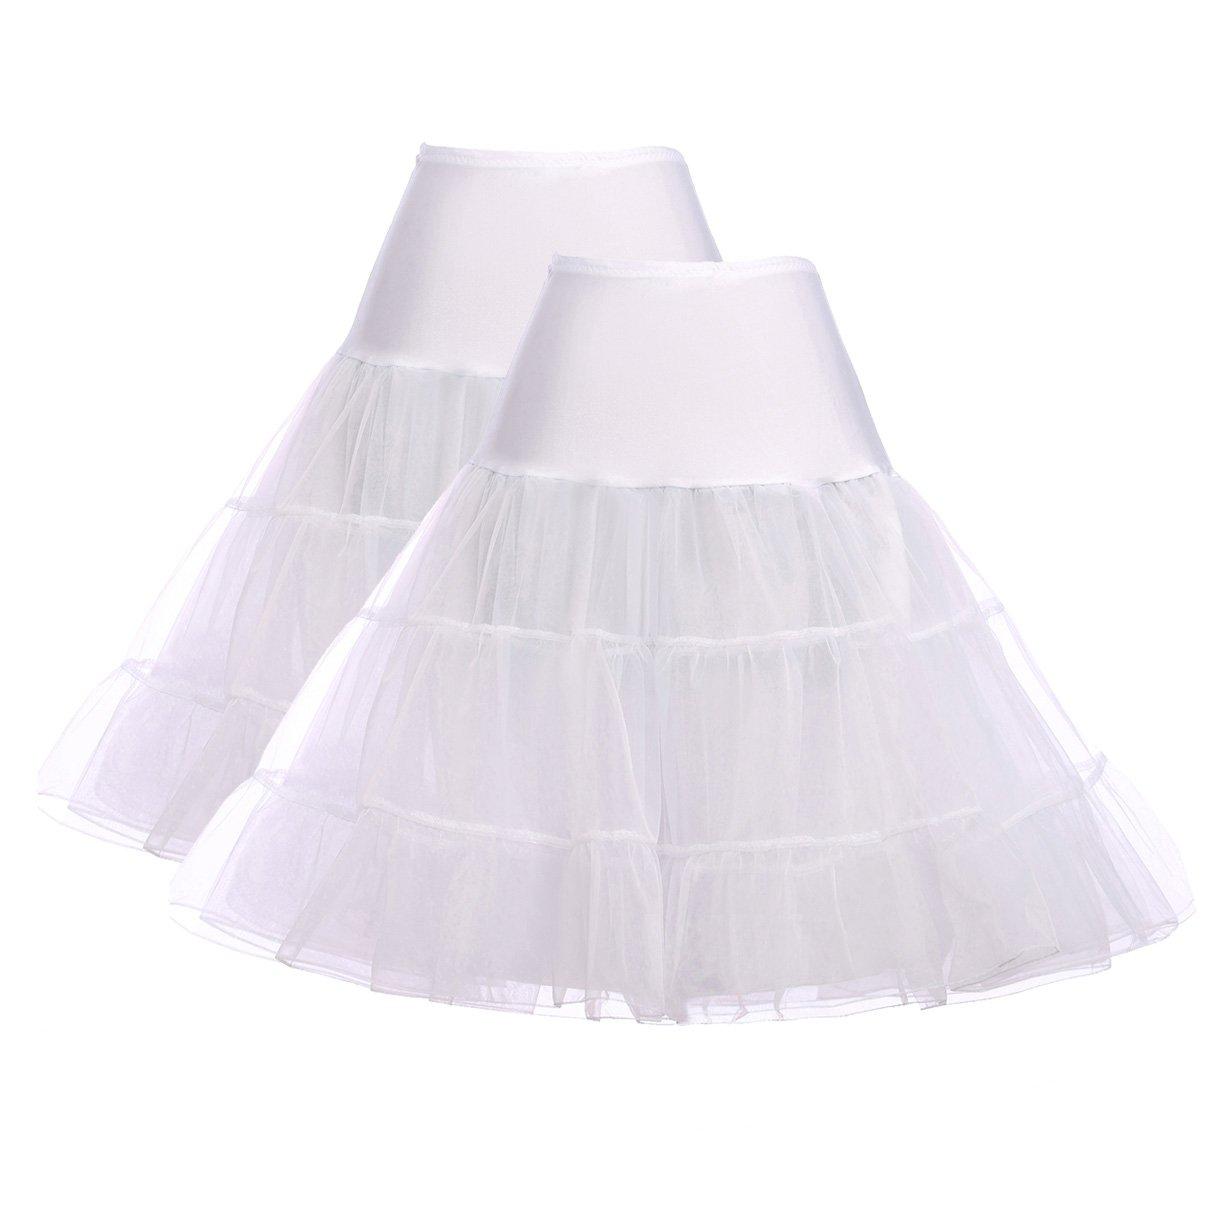 GRACE KARIN Womens 50s Vintage Petticoat Crinoline Tutu Underskirts Plus Size S-3X CL008922New